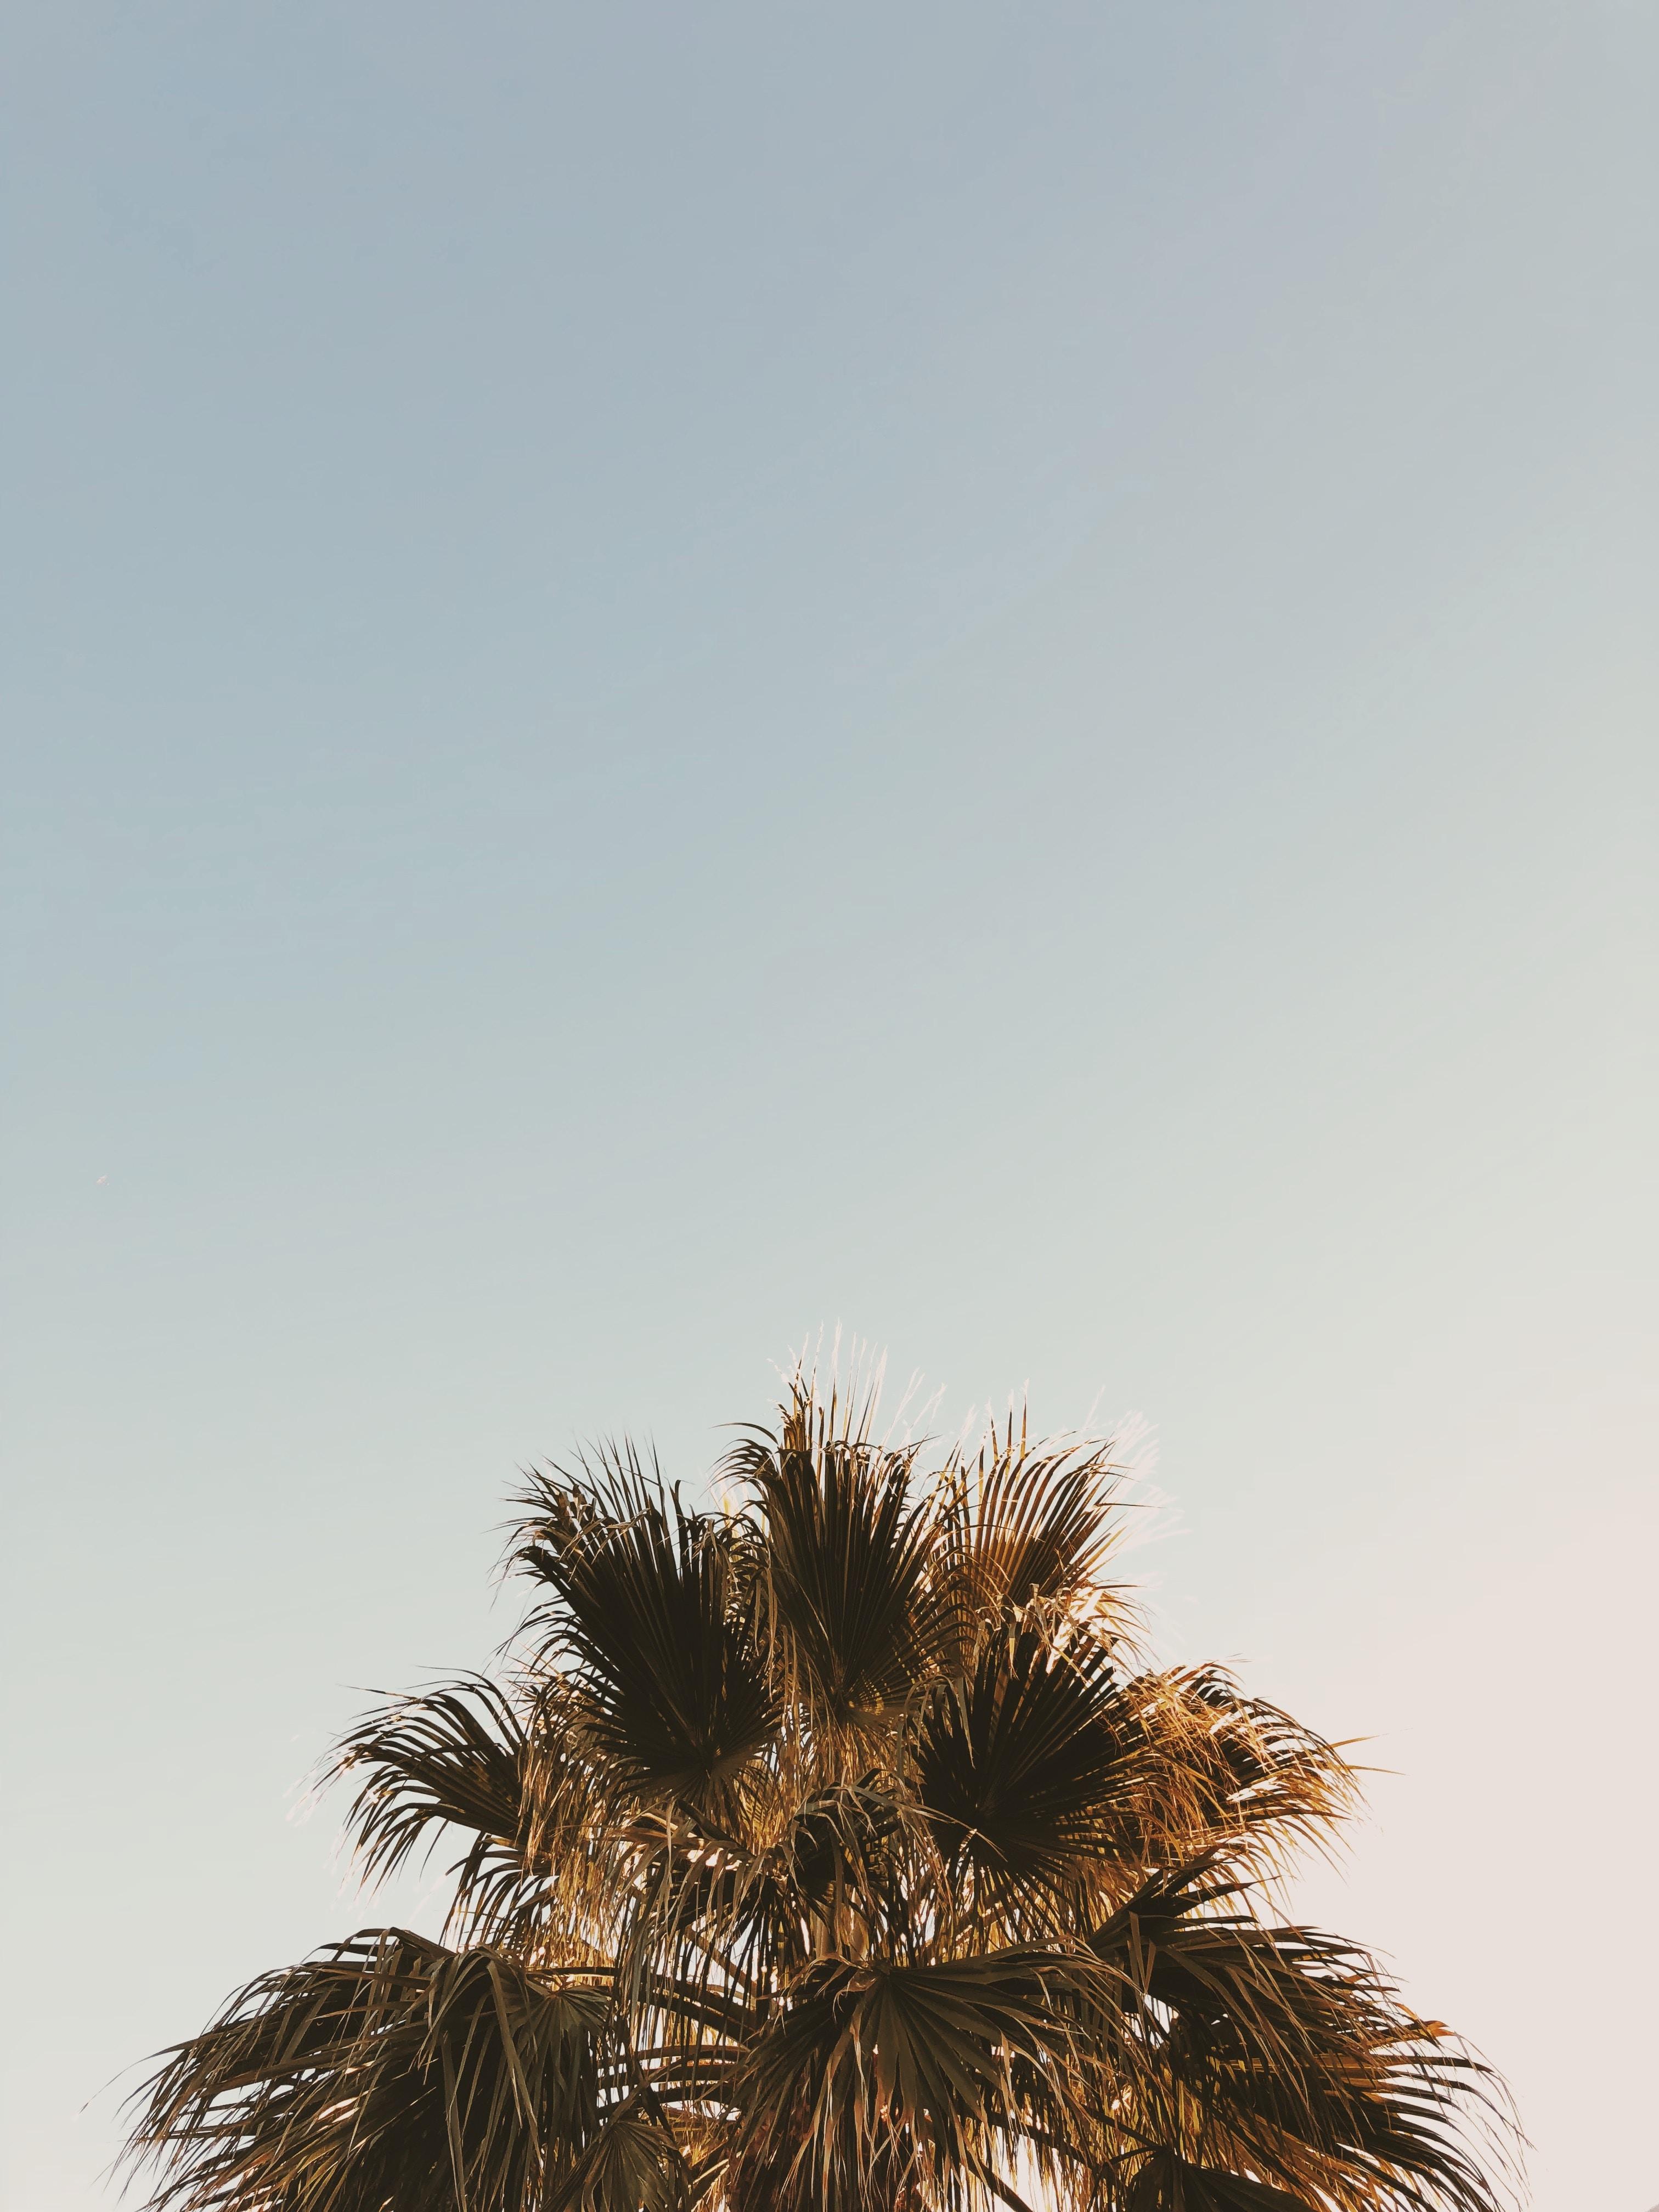 palm tree at daytime